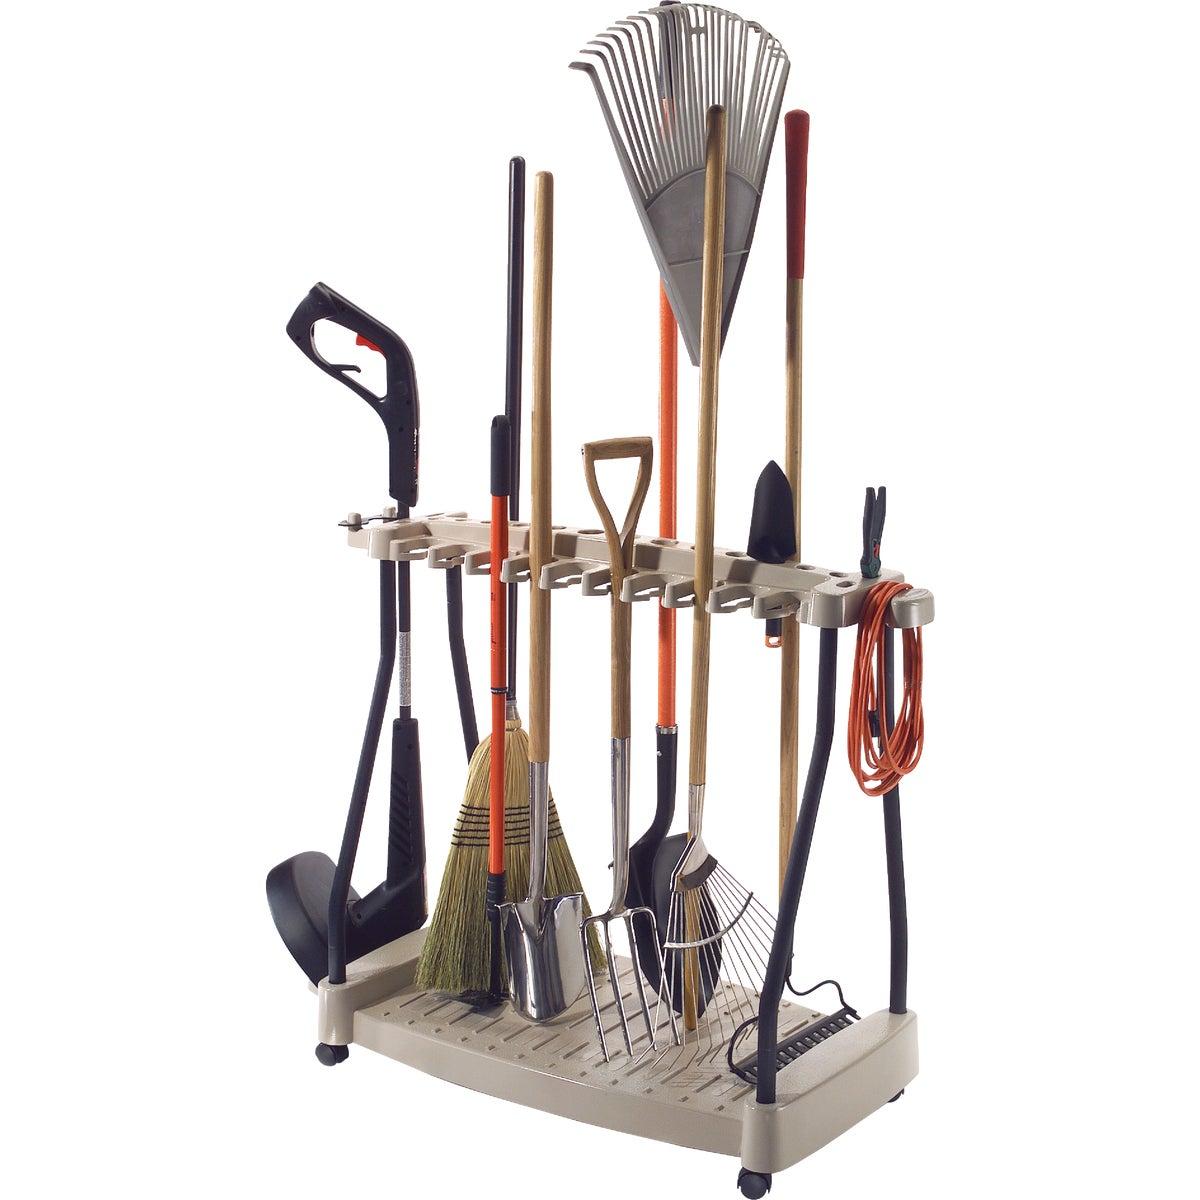 Suncast Long Handle Tool Rack With Wheels, RTC1000